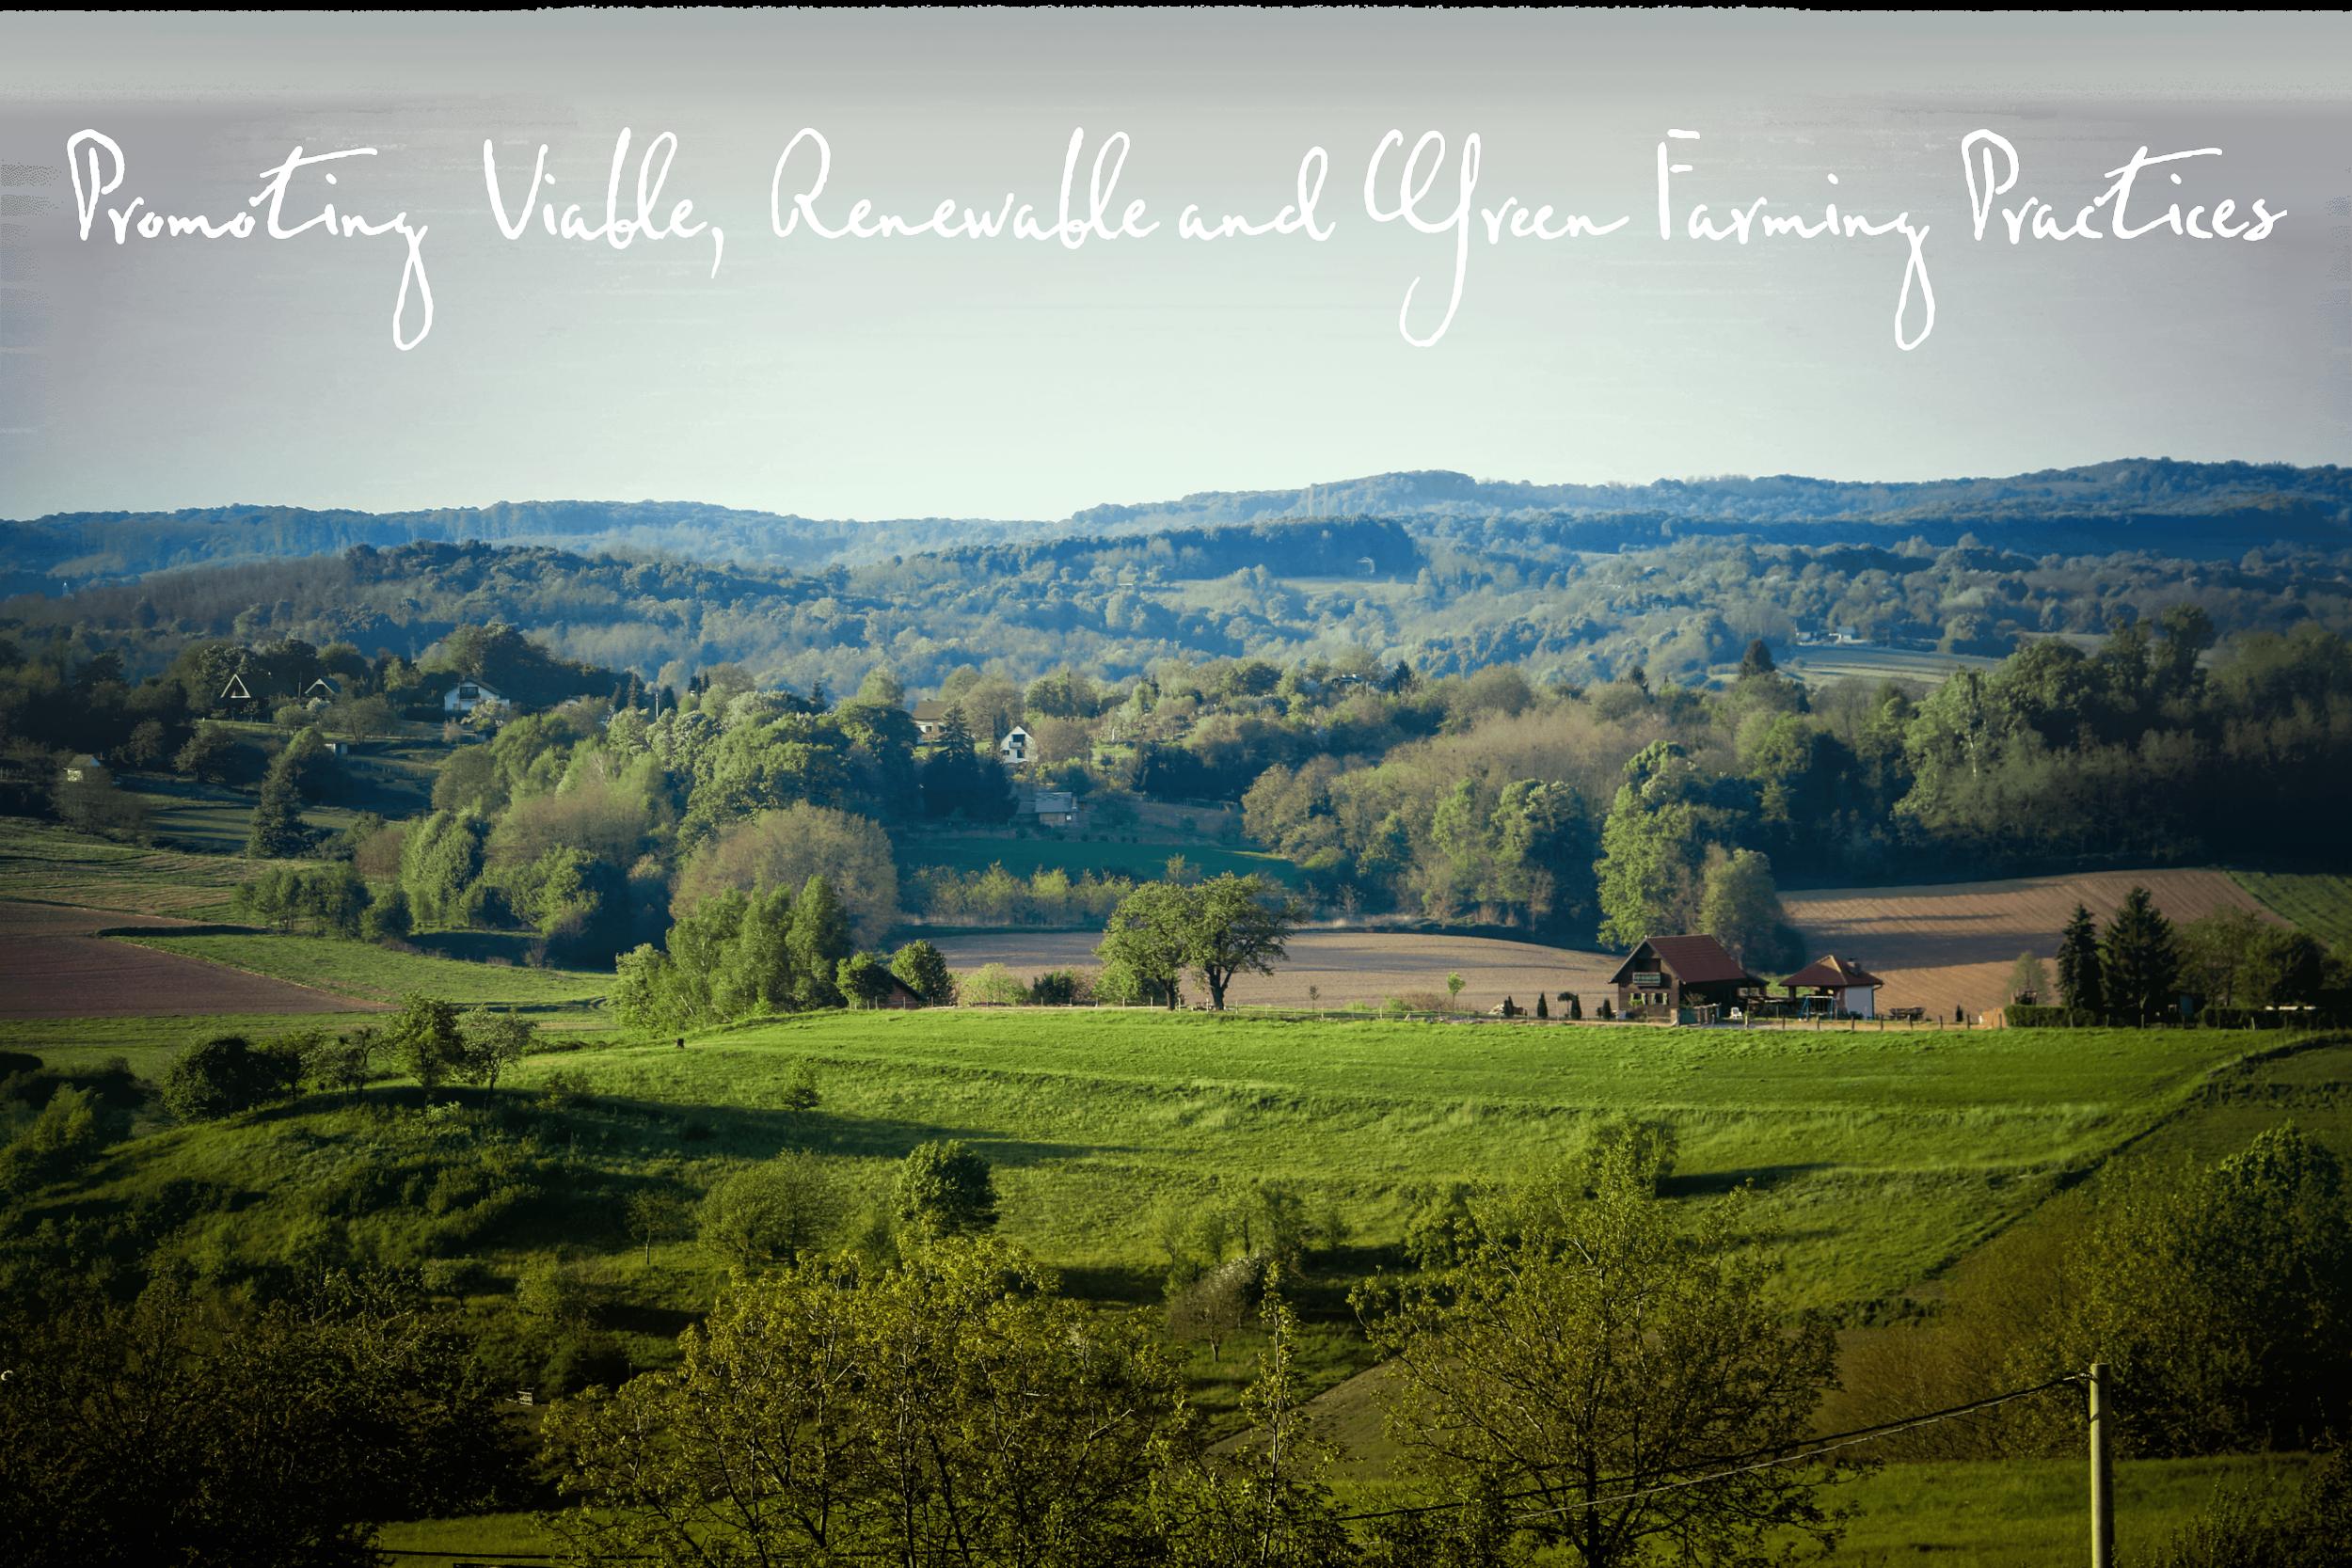 green hills and farmfinal-min.png